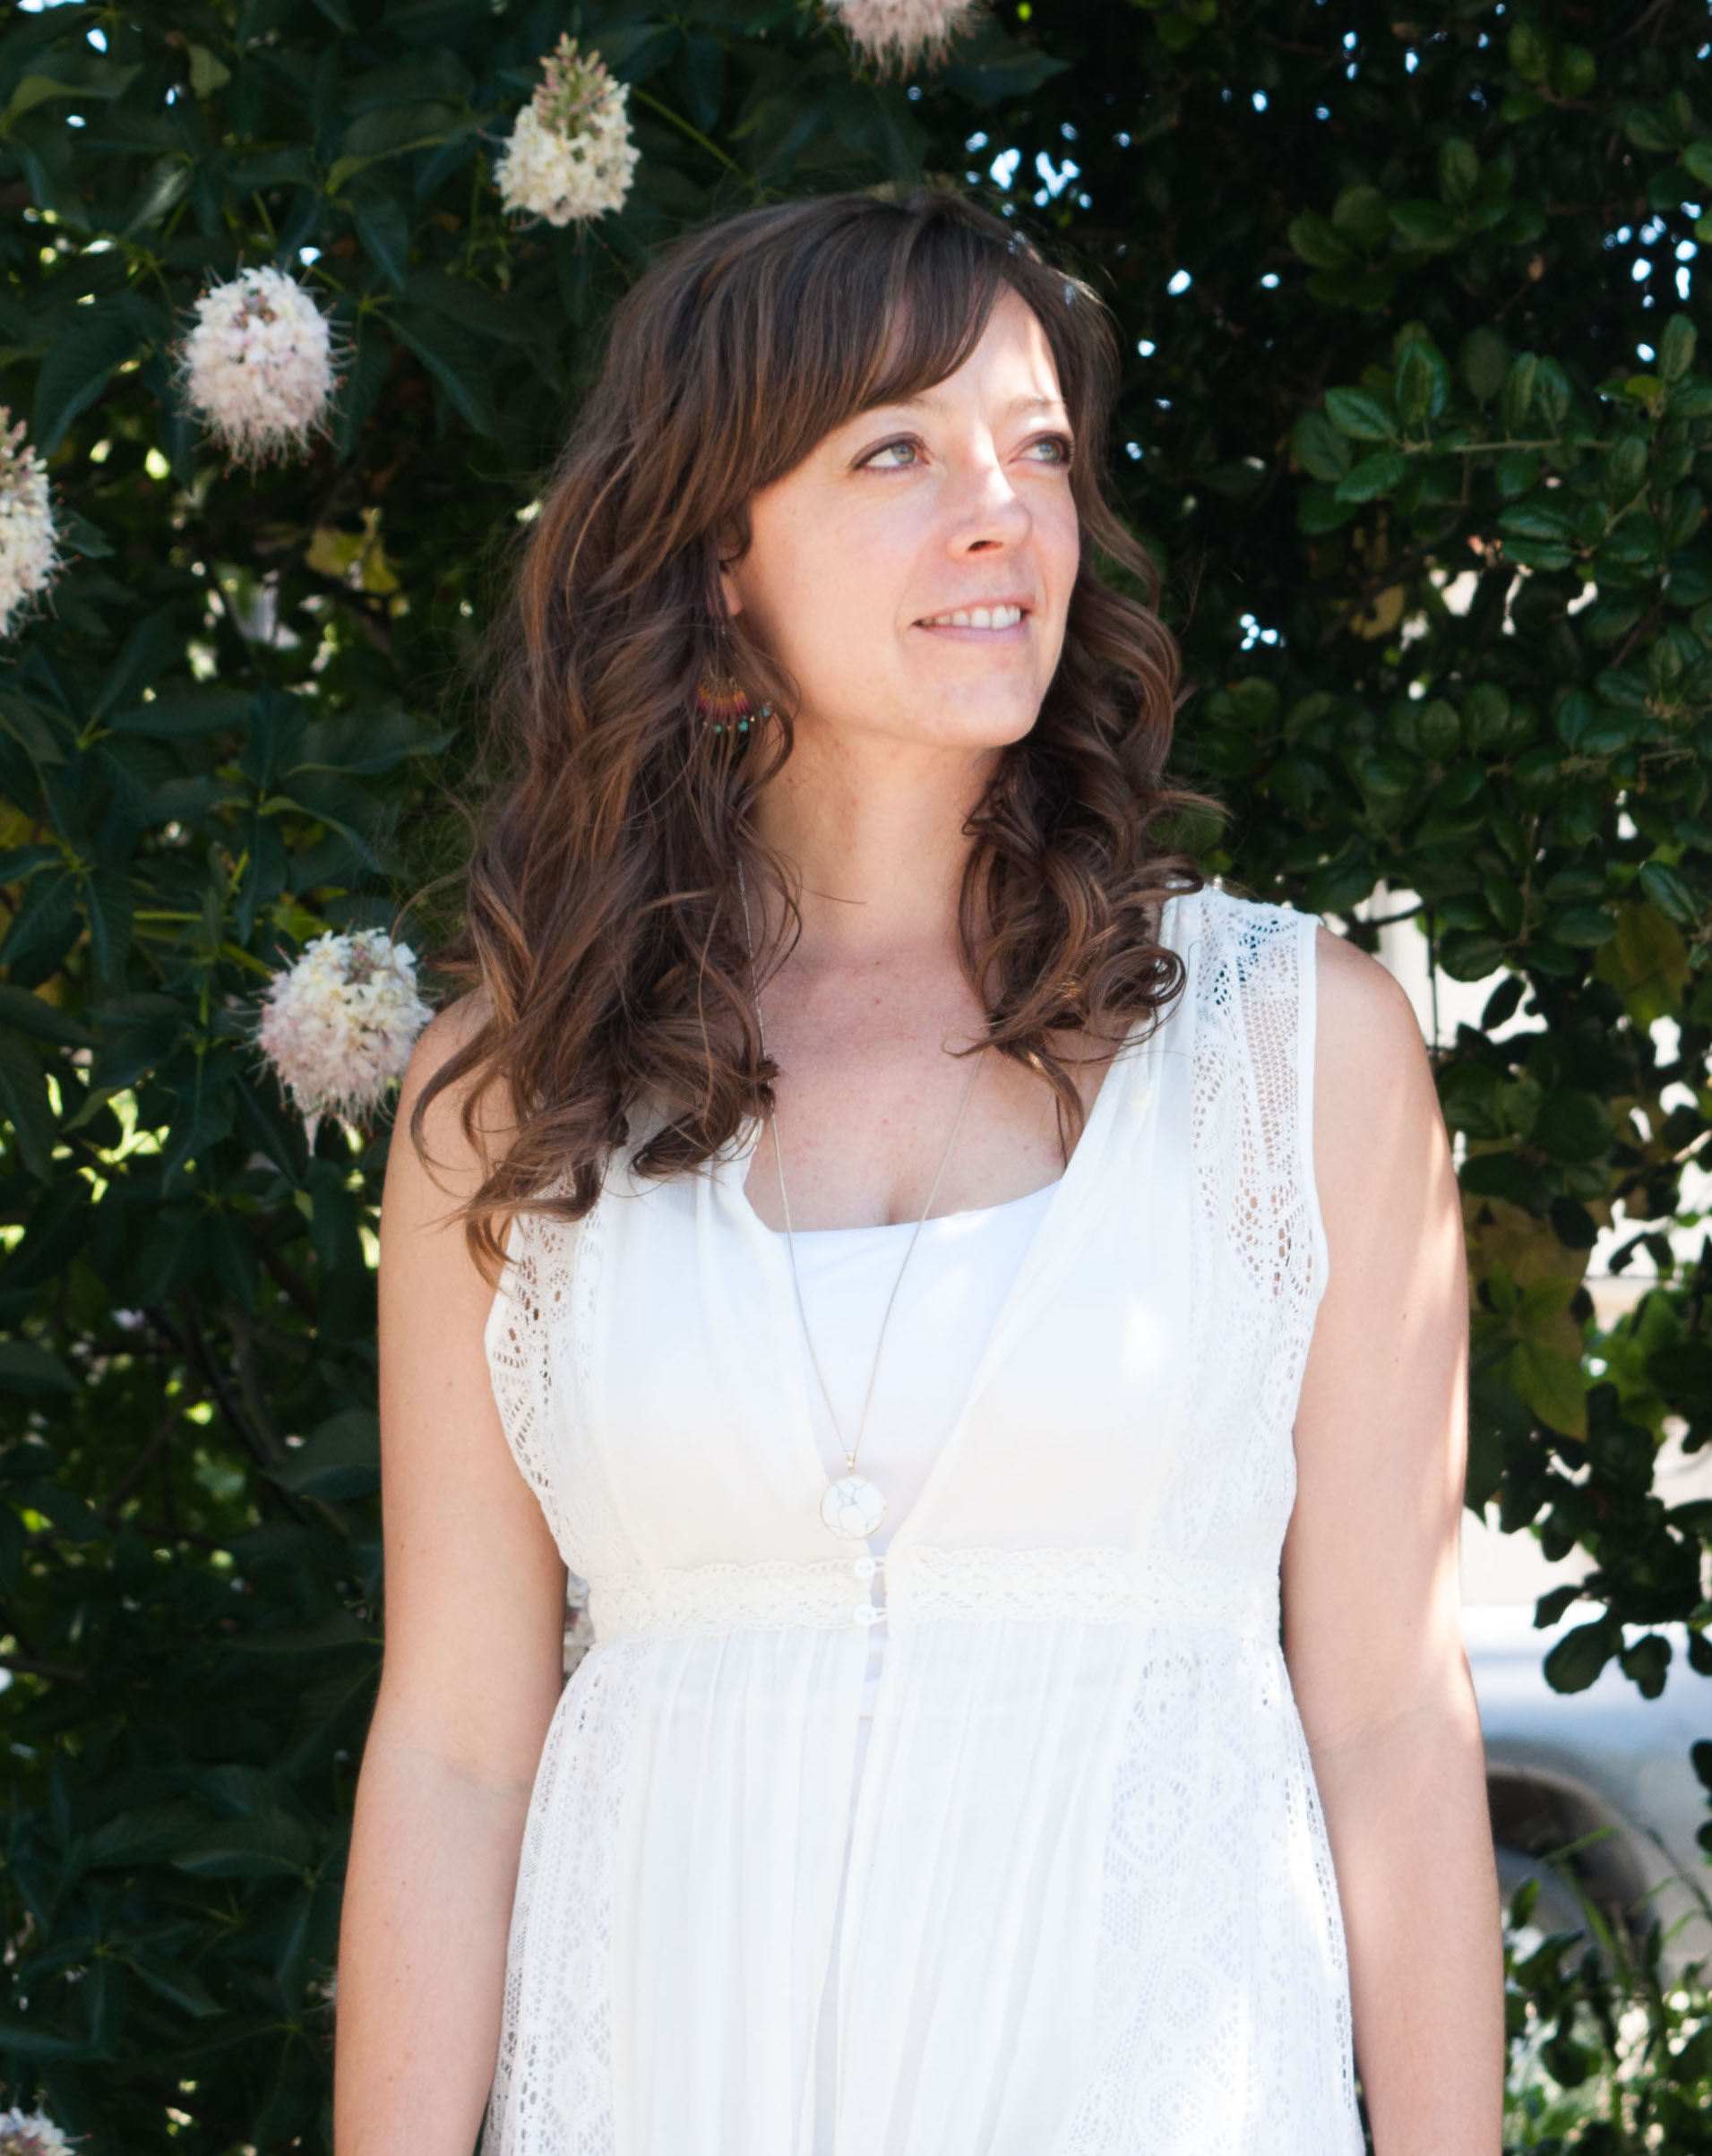 Megan Lipsett